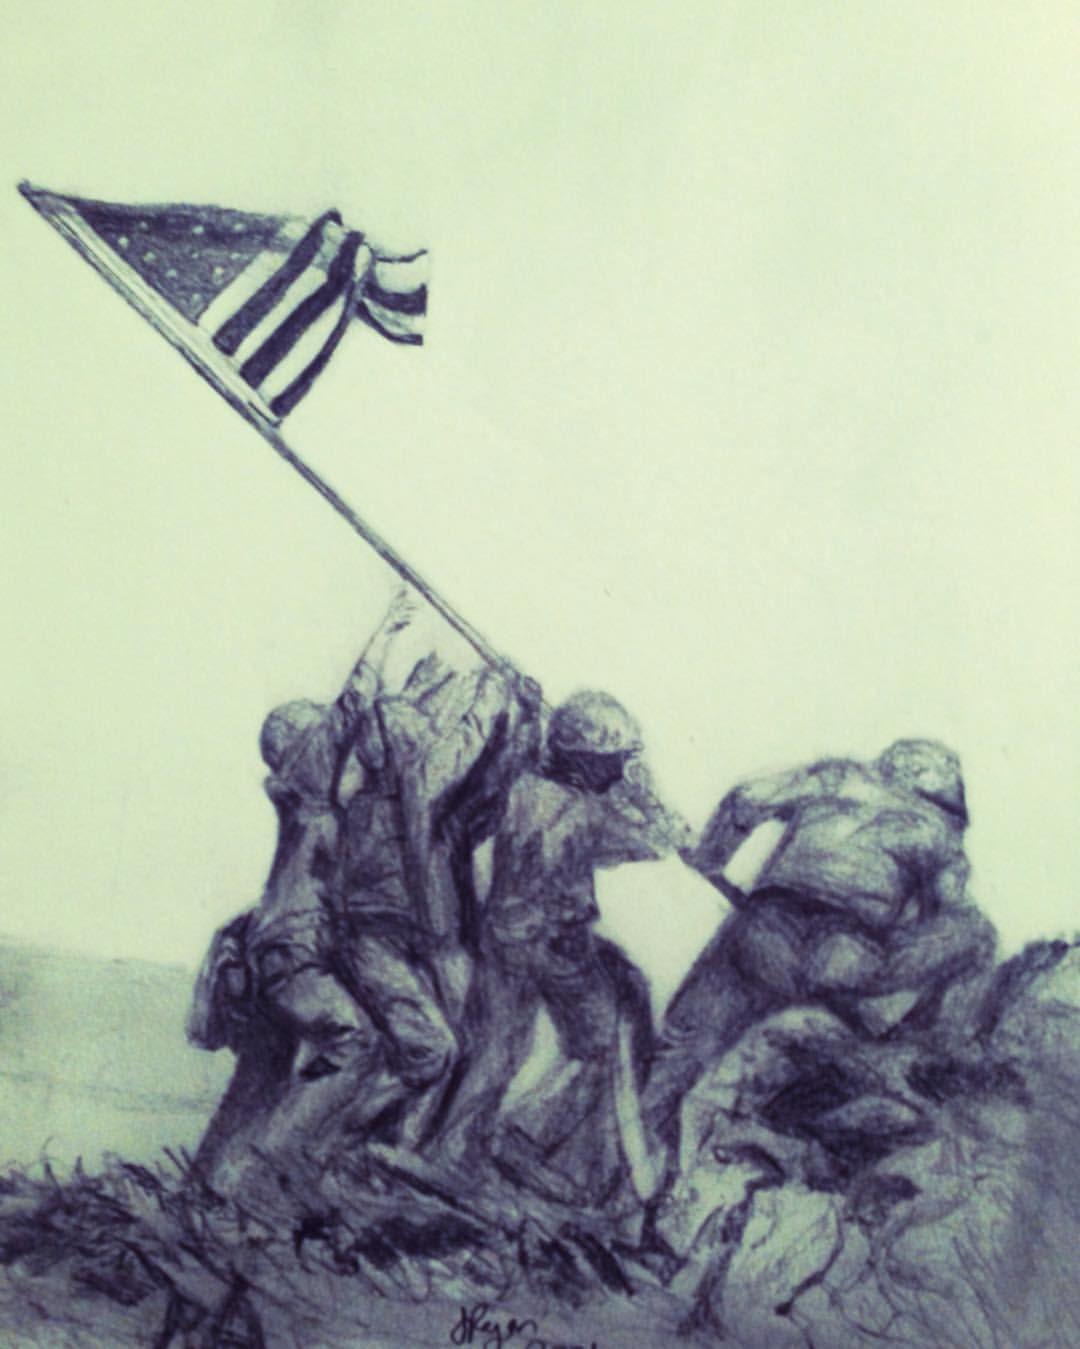 1080x1349 Colours Better Here! Raising The Flag On Iwo Jima. February 23